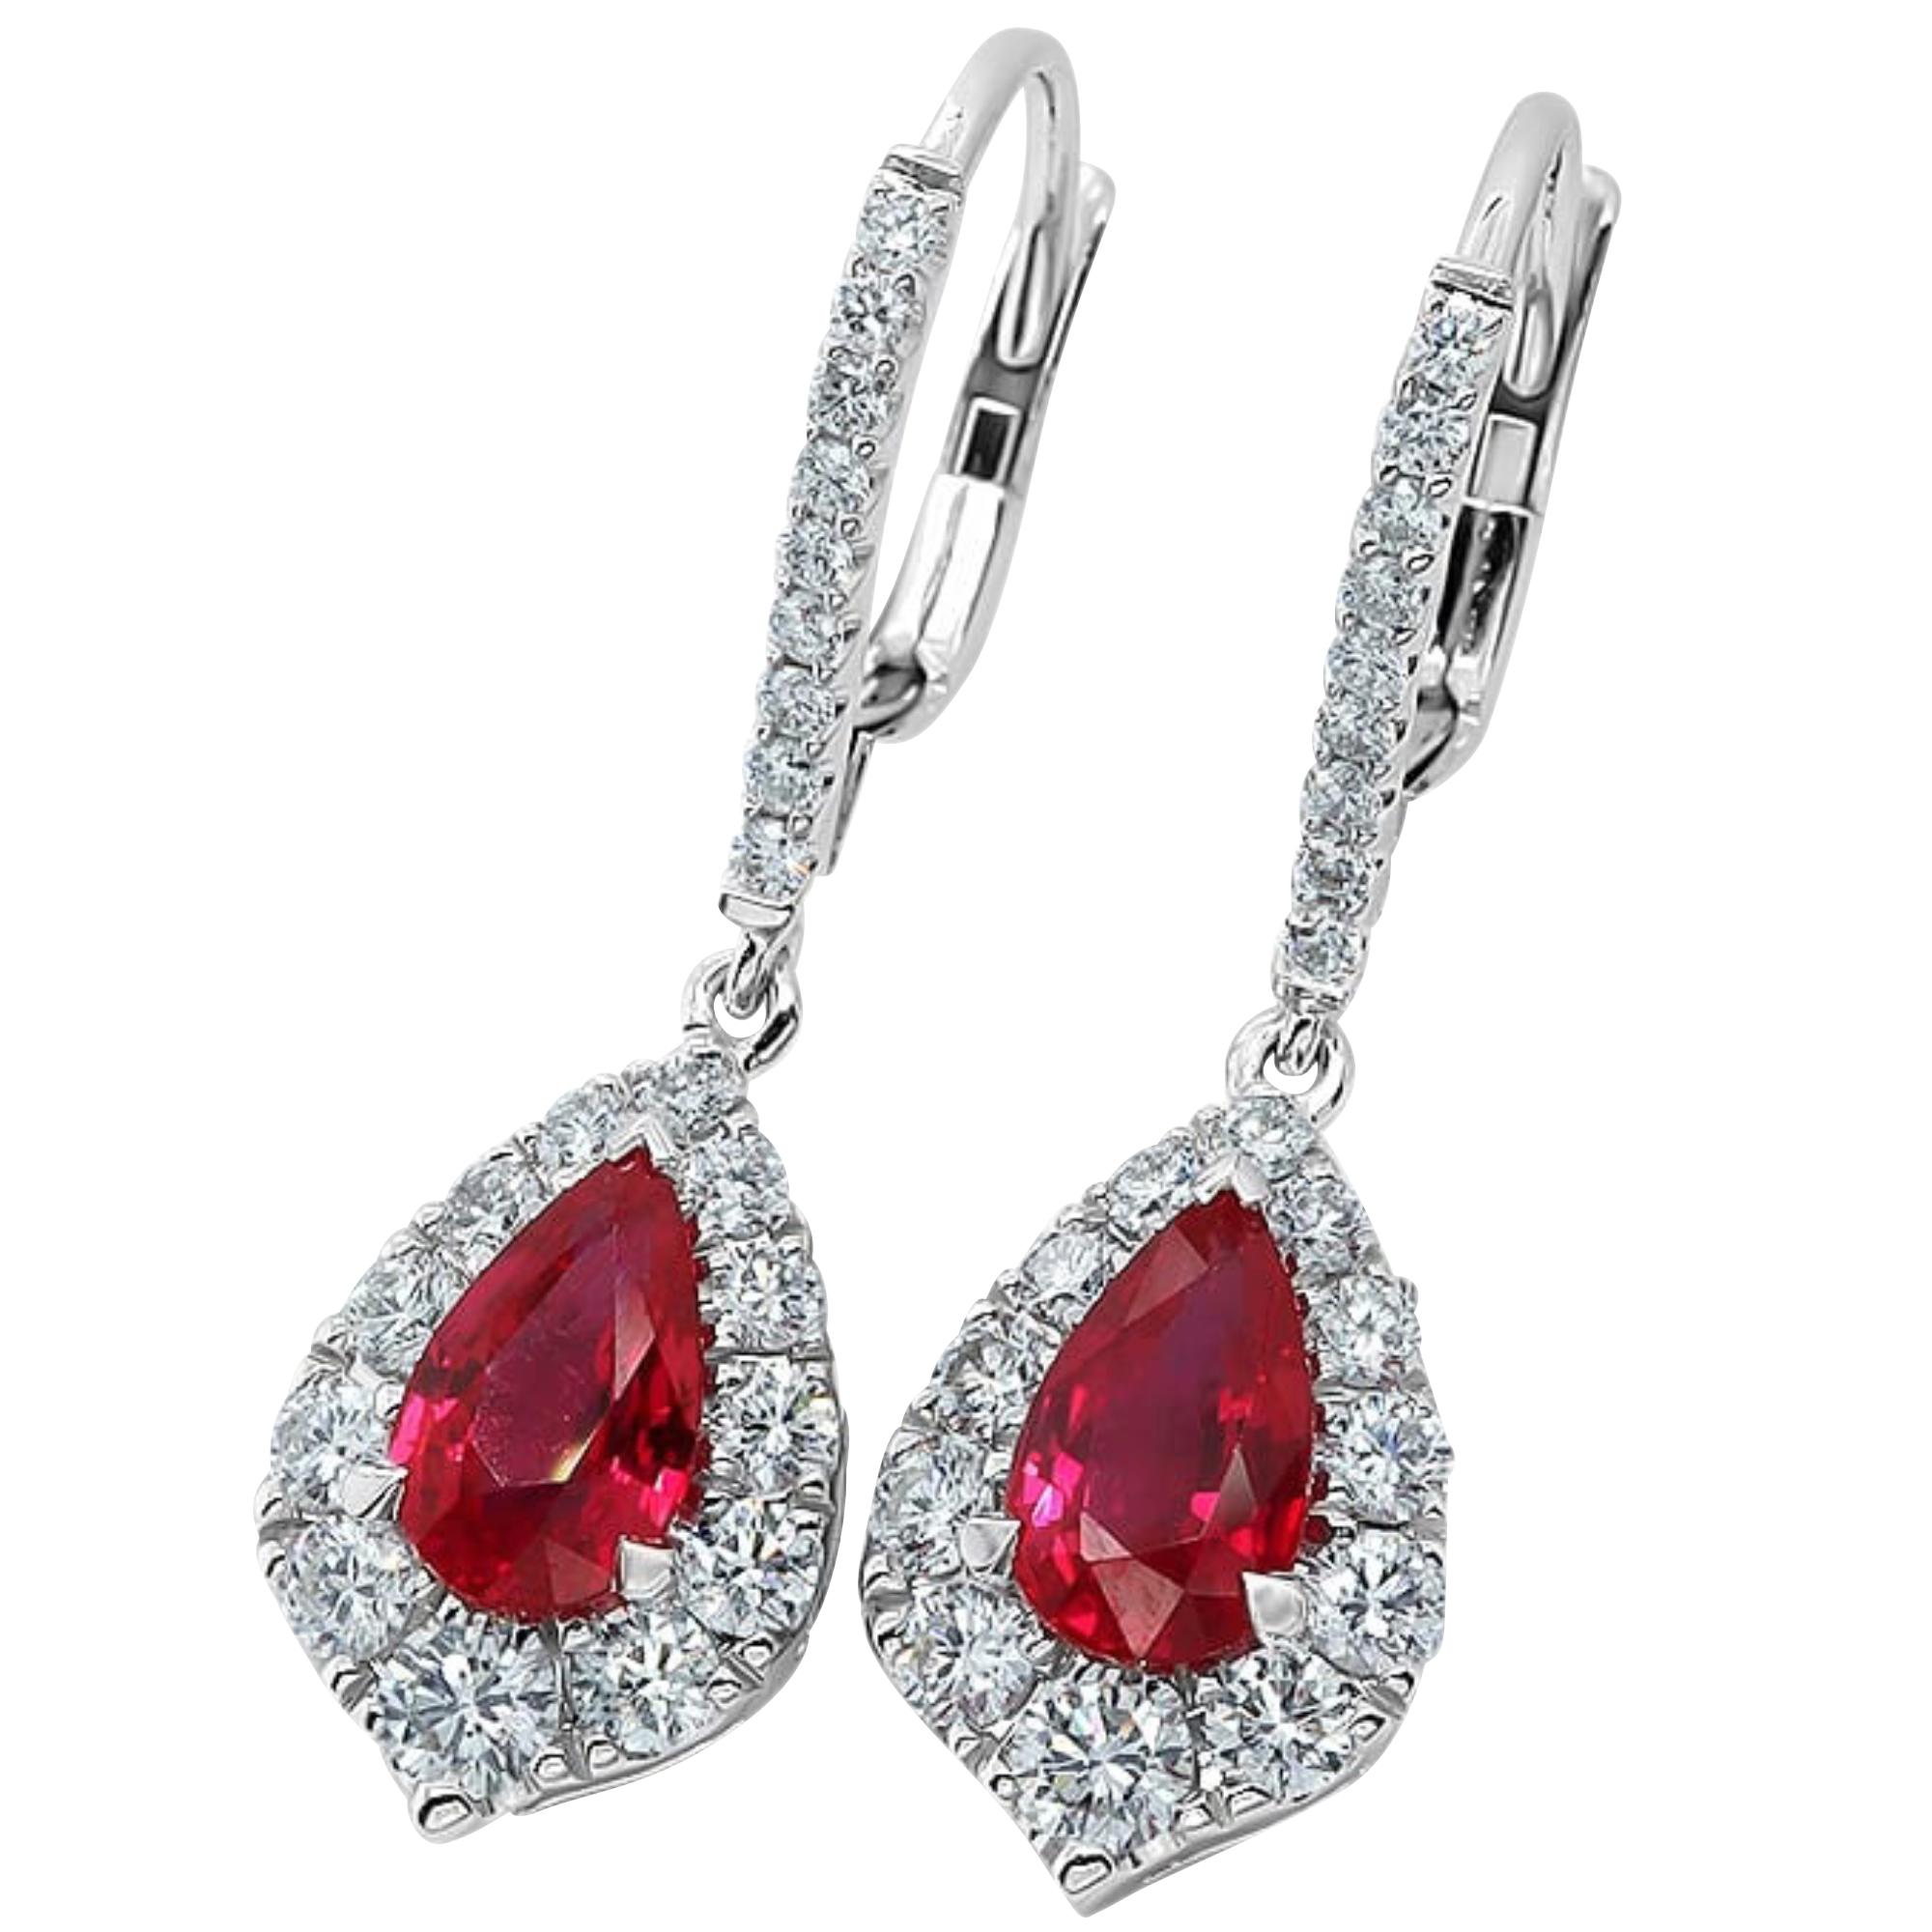 Ruby & Diamond 18ct White Gold Drop Earrings